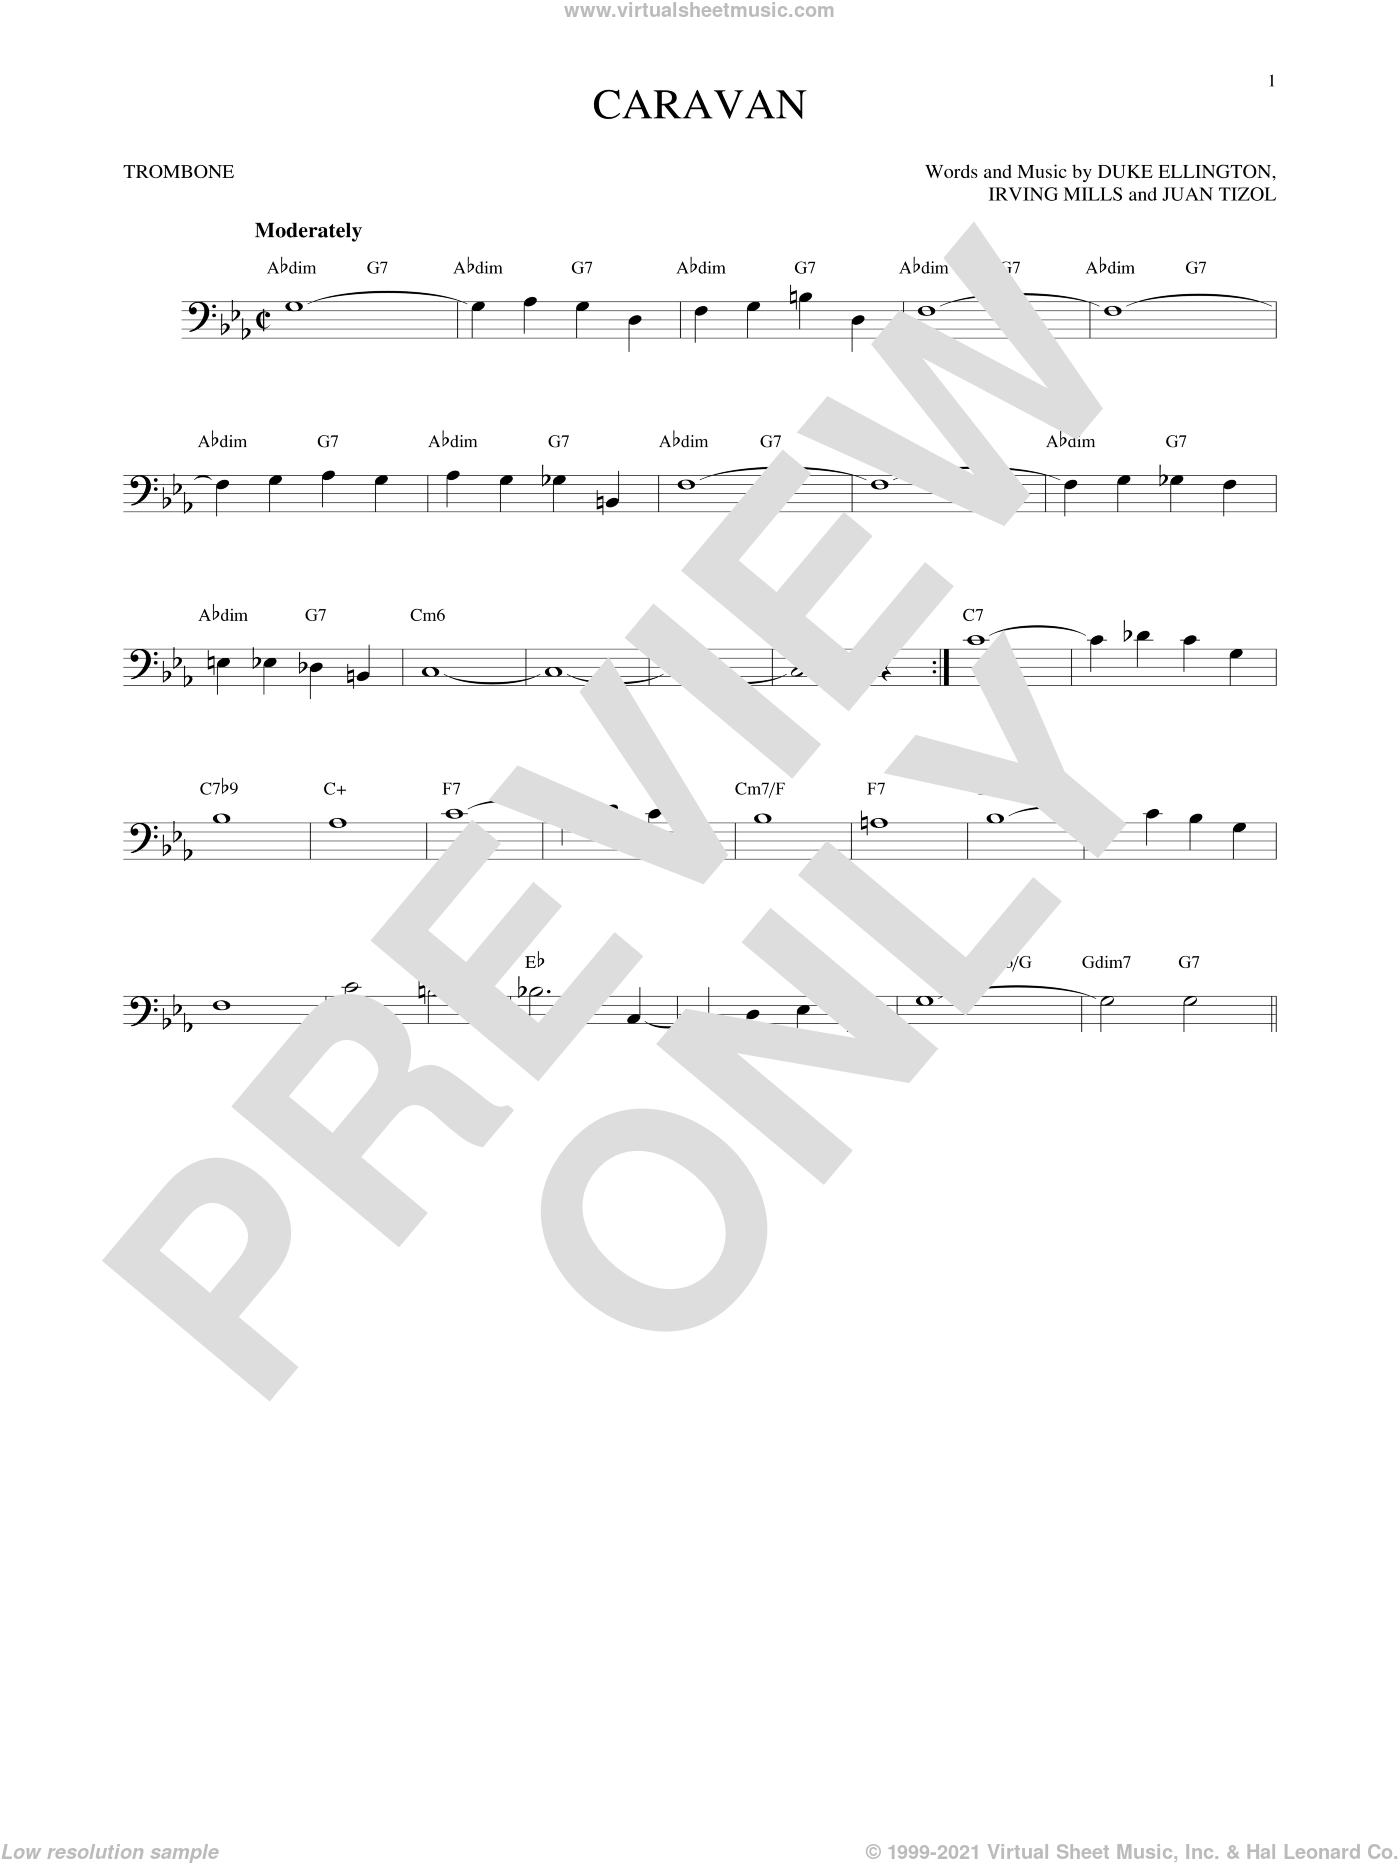 Caravan sheet music for trombone solo by Duke Ellington, Billy Eckstine, Duke Ellington and his Orchestra, Ralph Marterie, Irving Mills, Juan Tizol and Juan Tizol & Duke Ellington, intermediate skill level